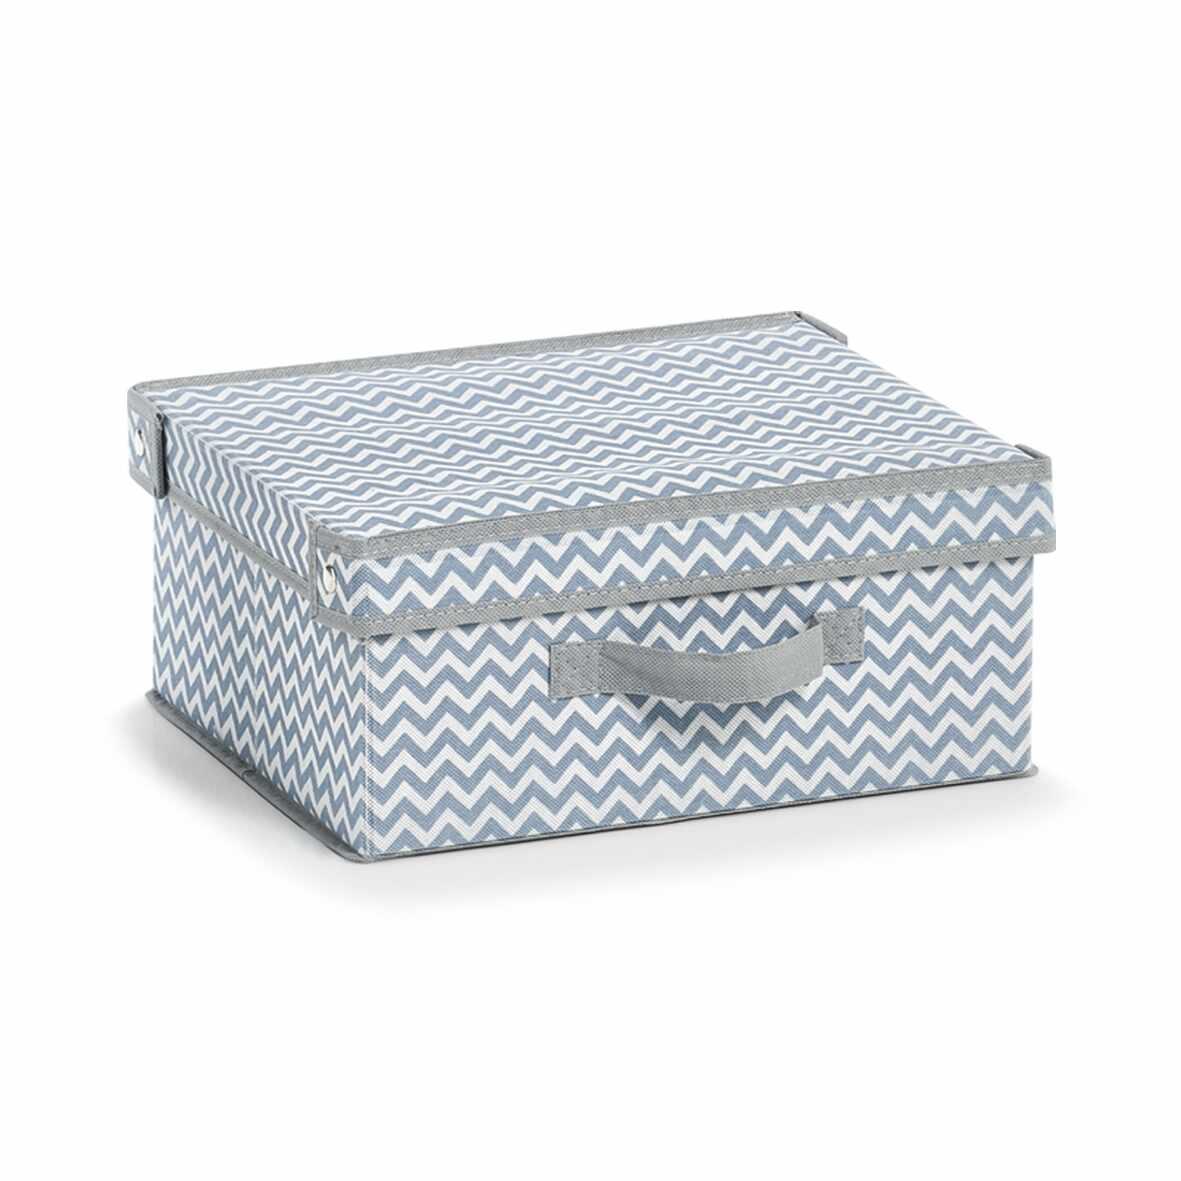 Organizator textil pliabil pentru sertar cu capac, Alb / Gri Zig Zag, l33xA28xH15 cm la pret 38 lei